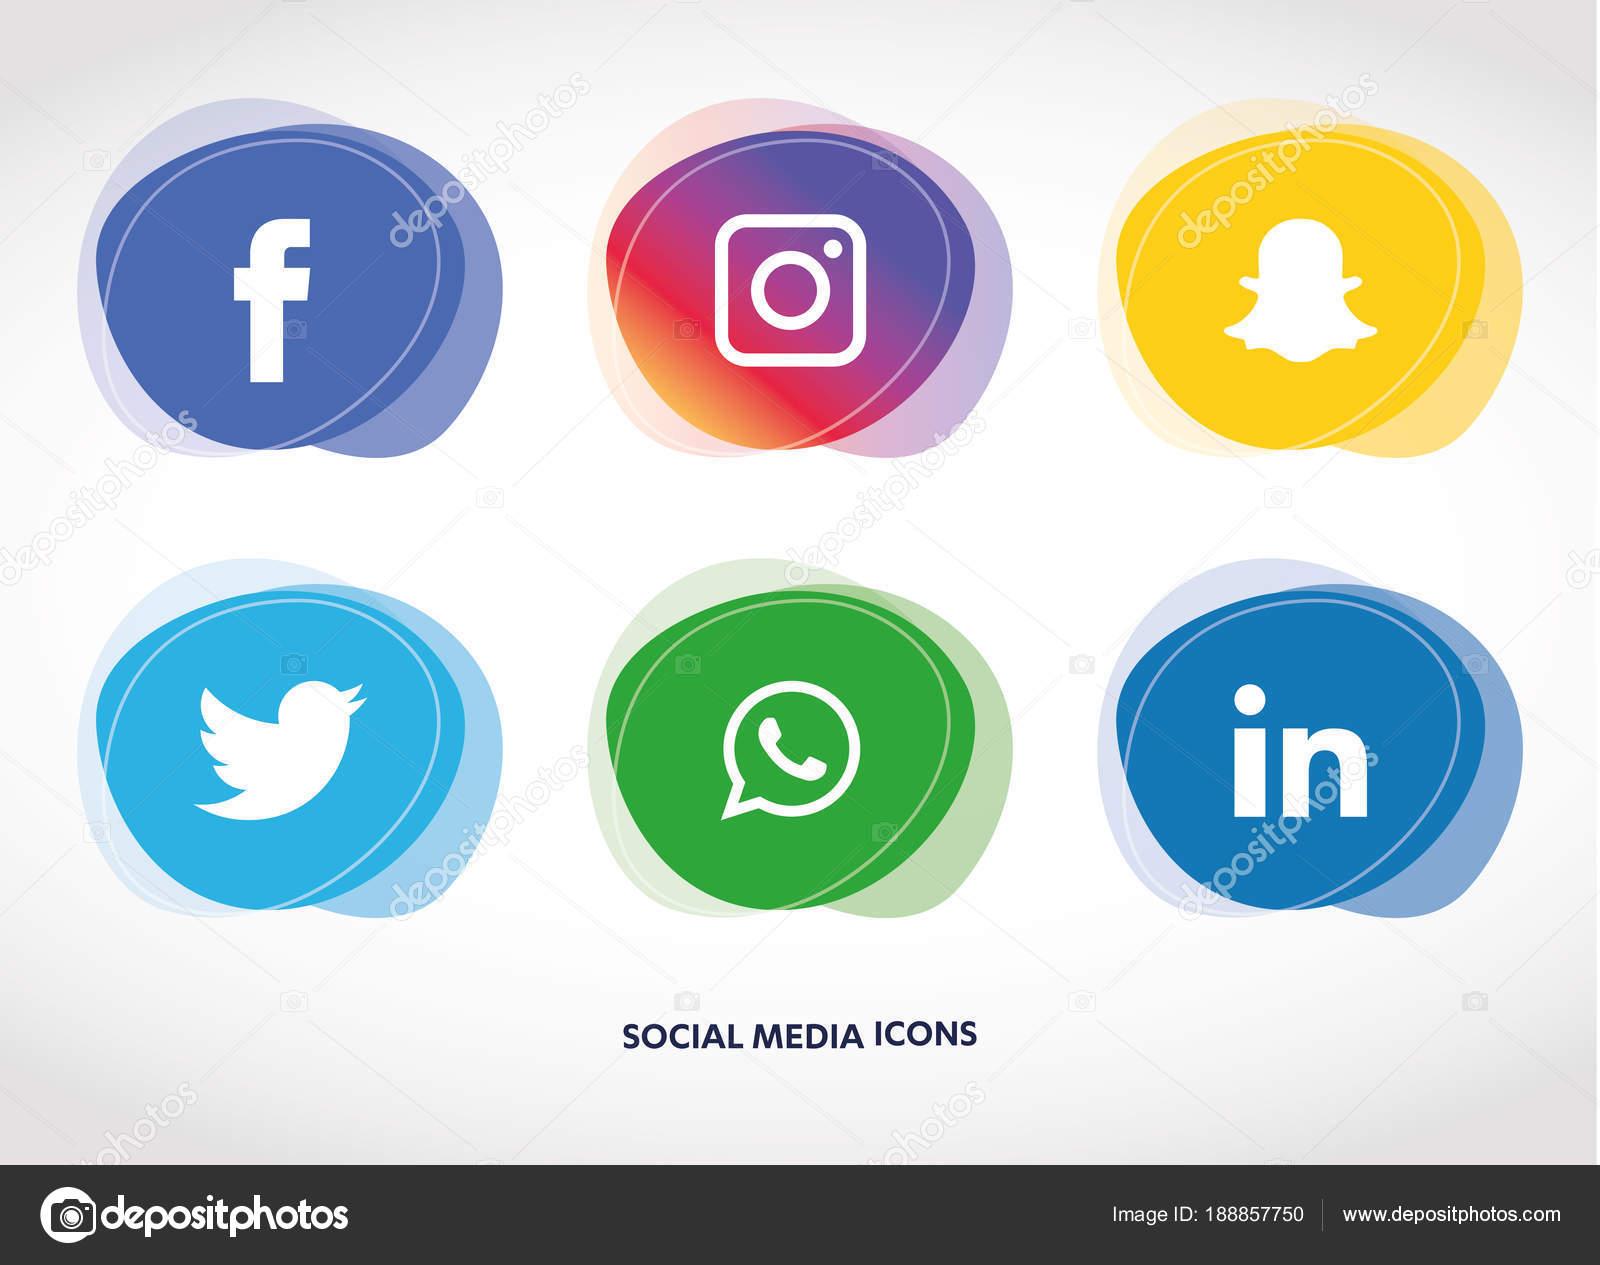 Social media icons set. facebook, instagram, Whatsapp, Snapchat, Youtube,  linkedin, in, twitter, — Vector by designmaster81 907c11069d